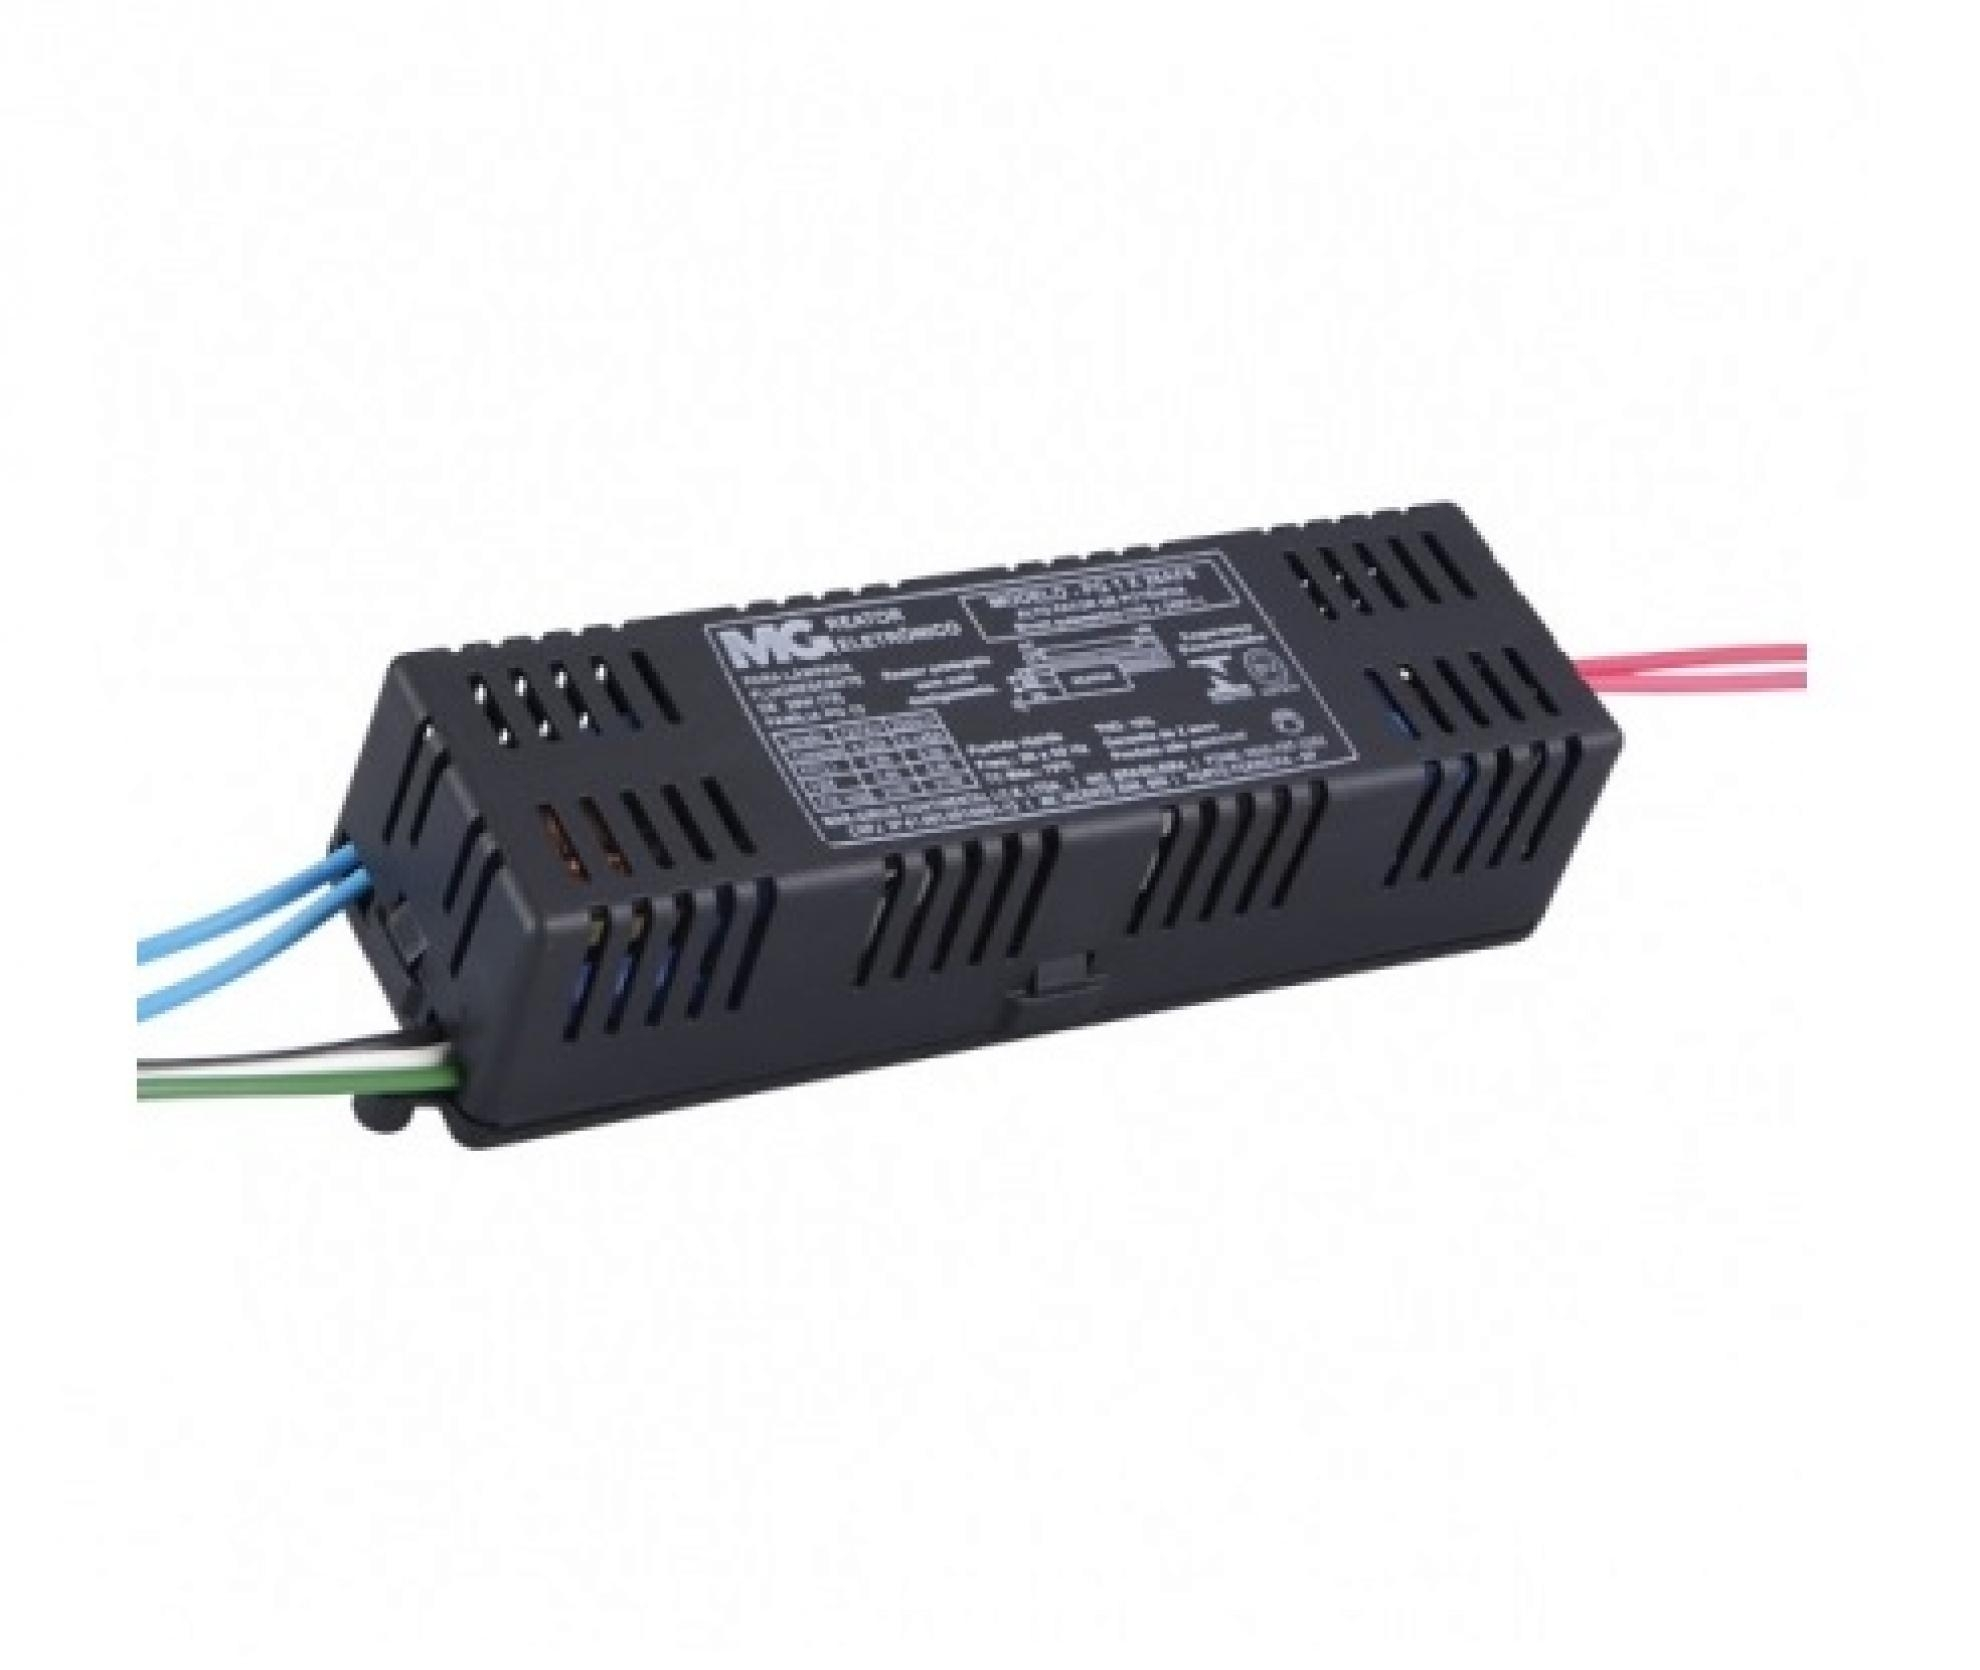 Reator Eletr�nico T5 para 2 l�mpada de 28W